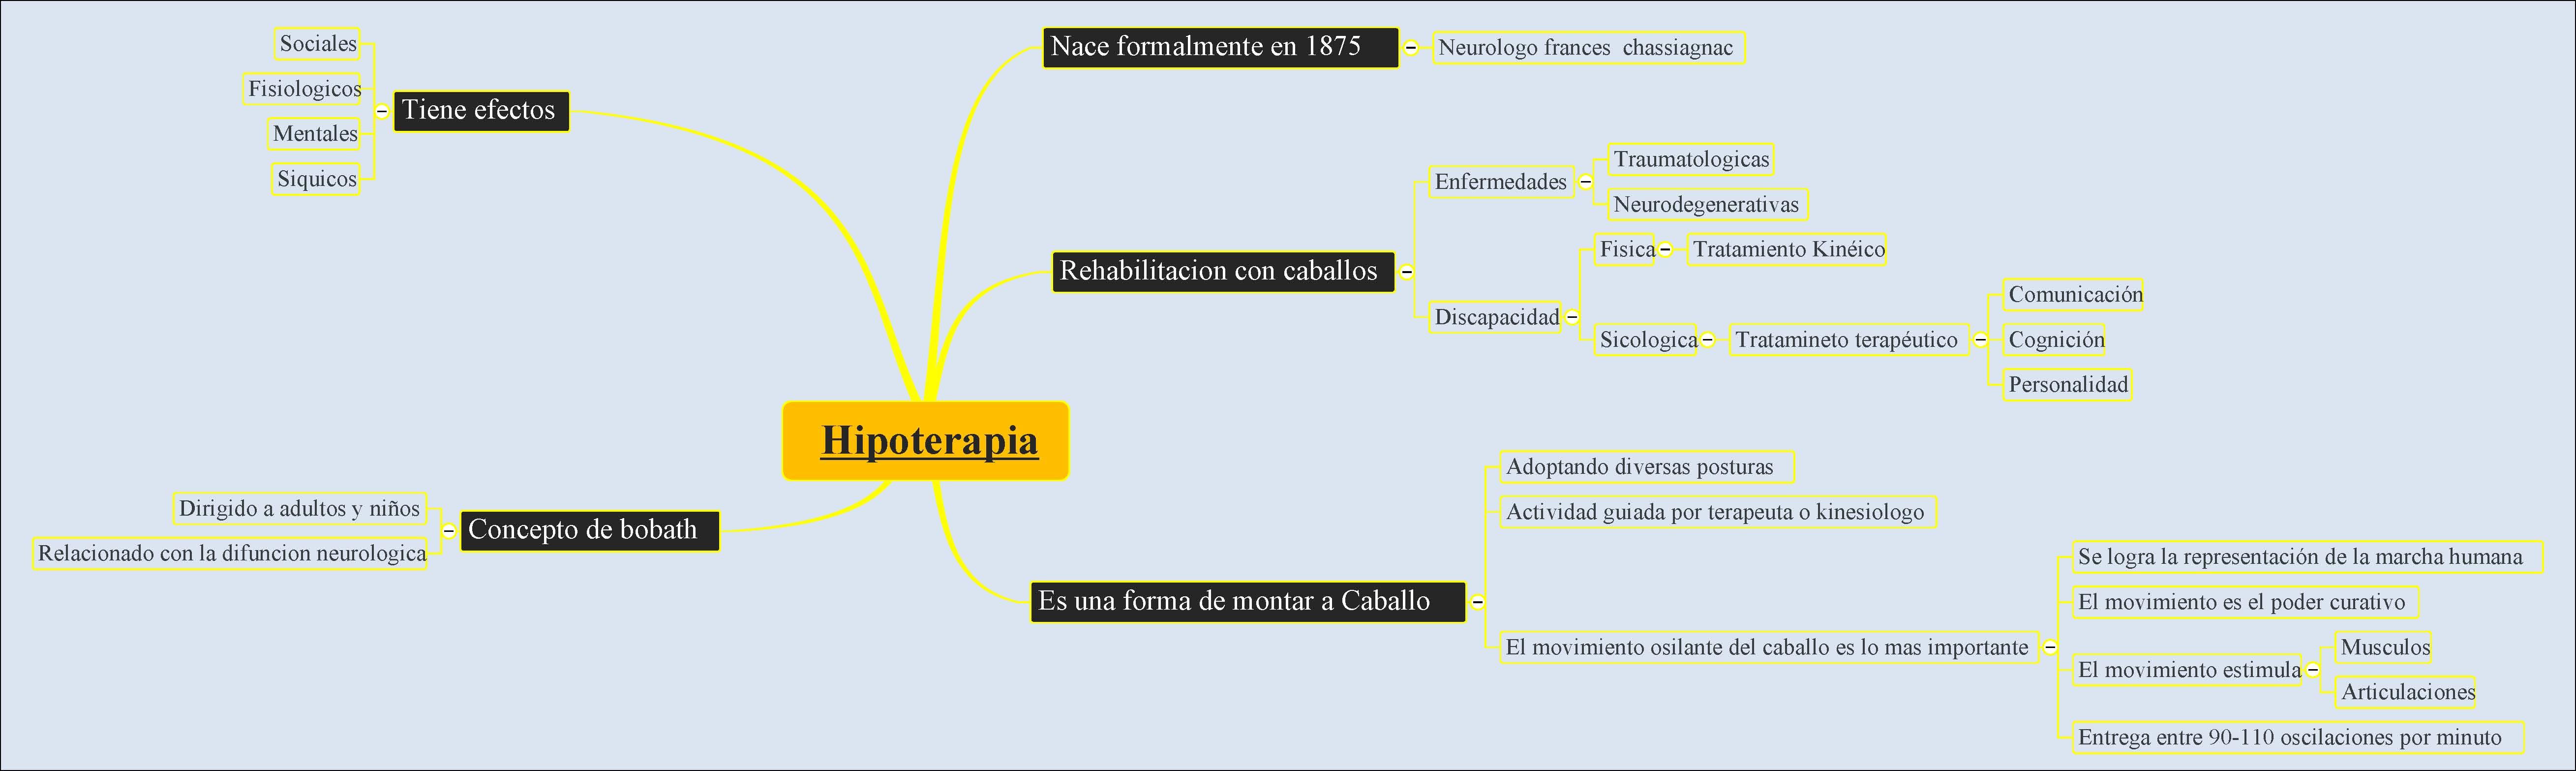 Mapa Conceptual Hipoterapia Equinoterapia